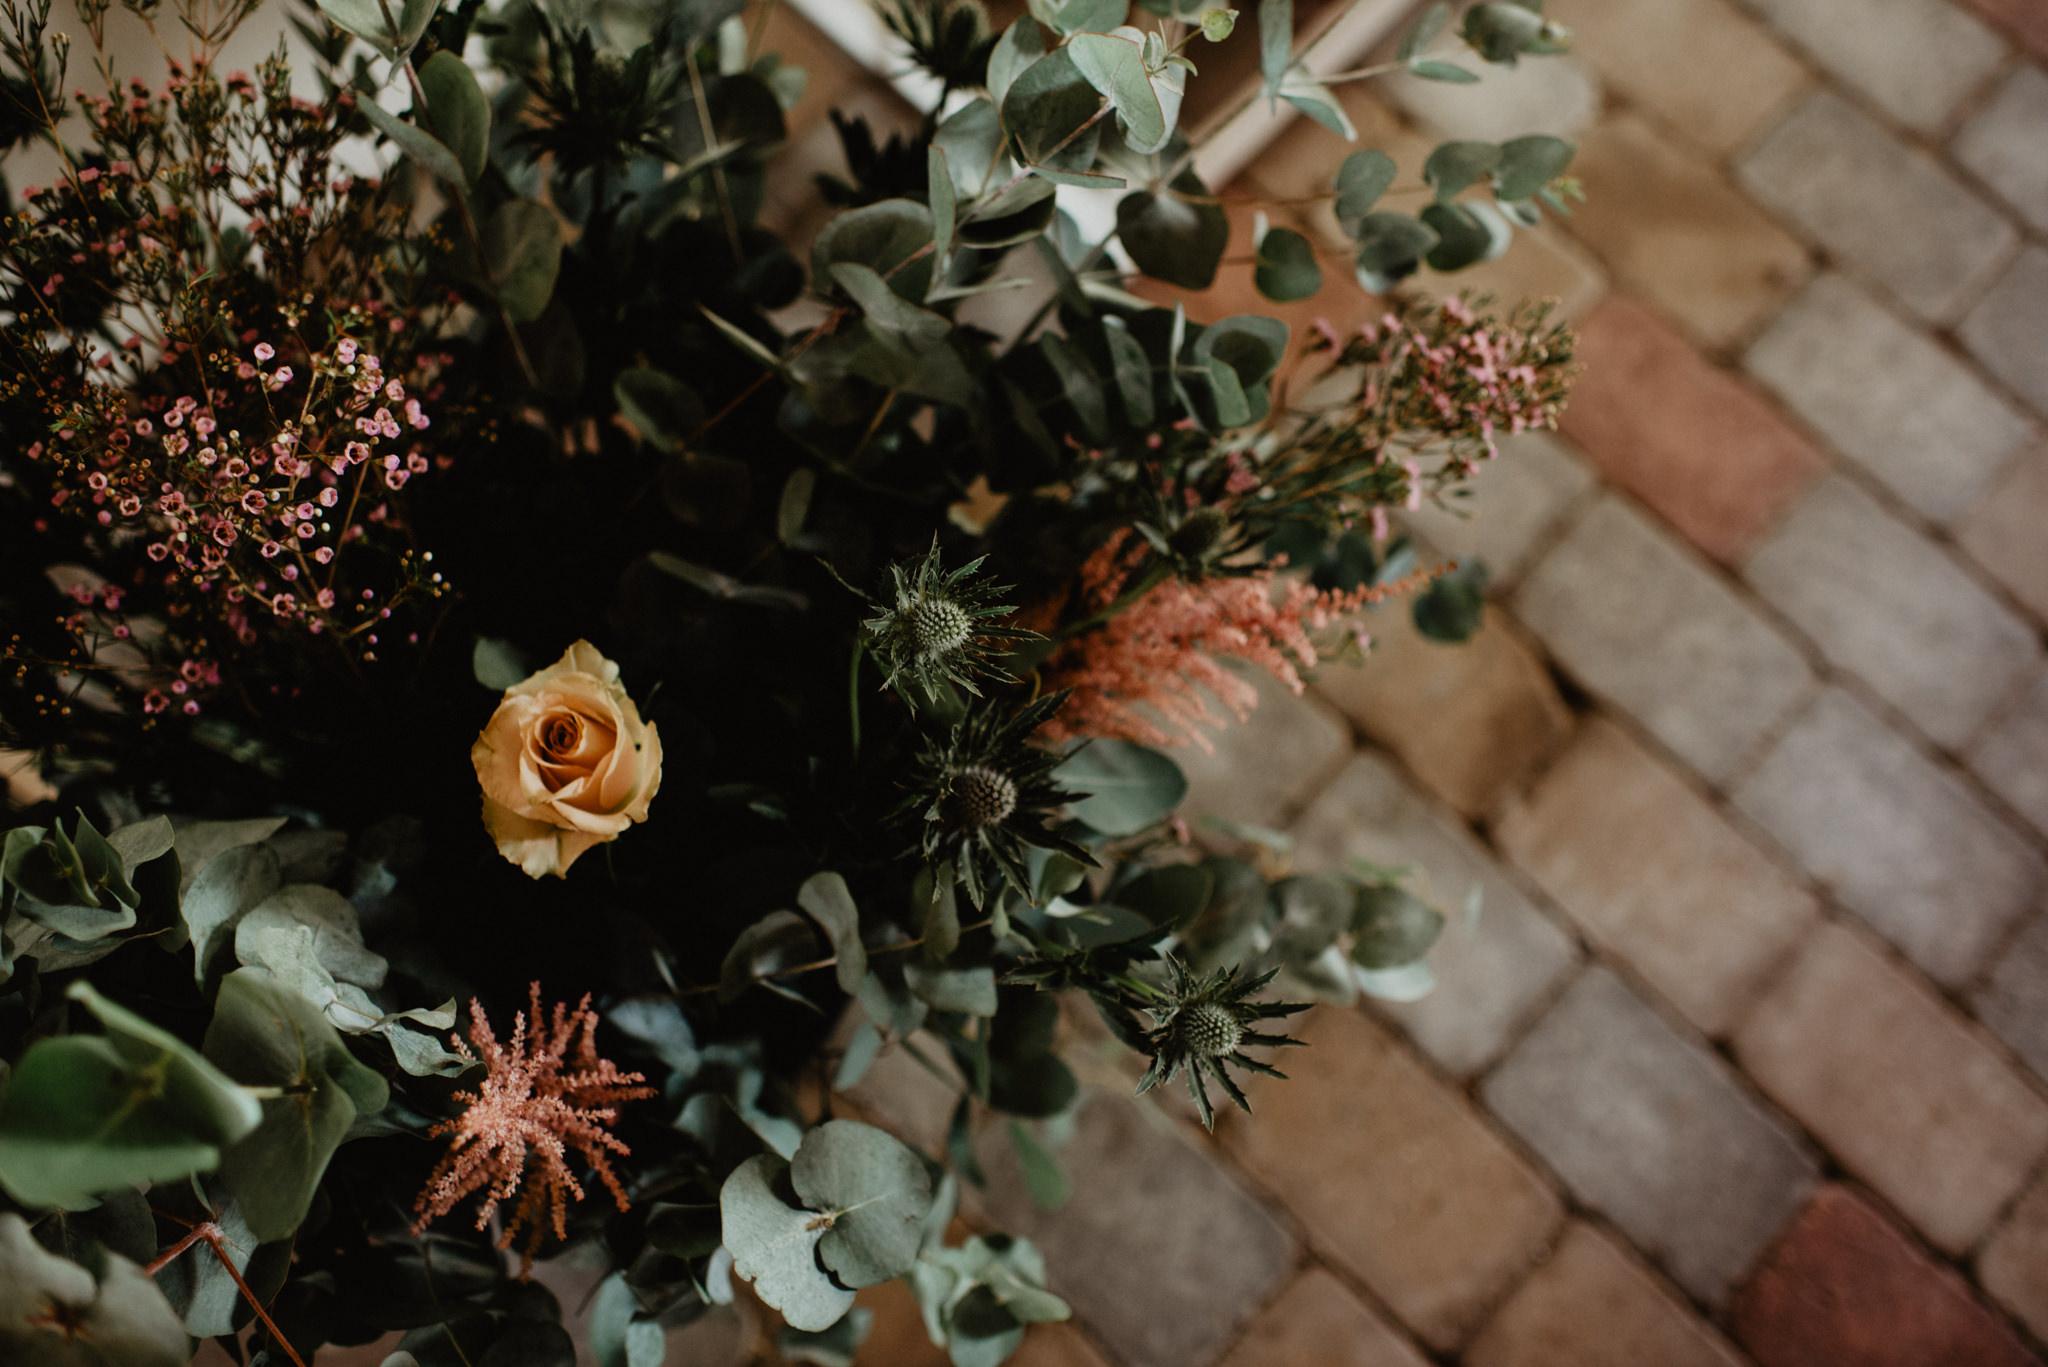 bohemiskt-bröllop-på-nygård-event-i-åstorp-bröllopsfotograf-skåne-157.jpg